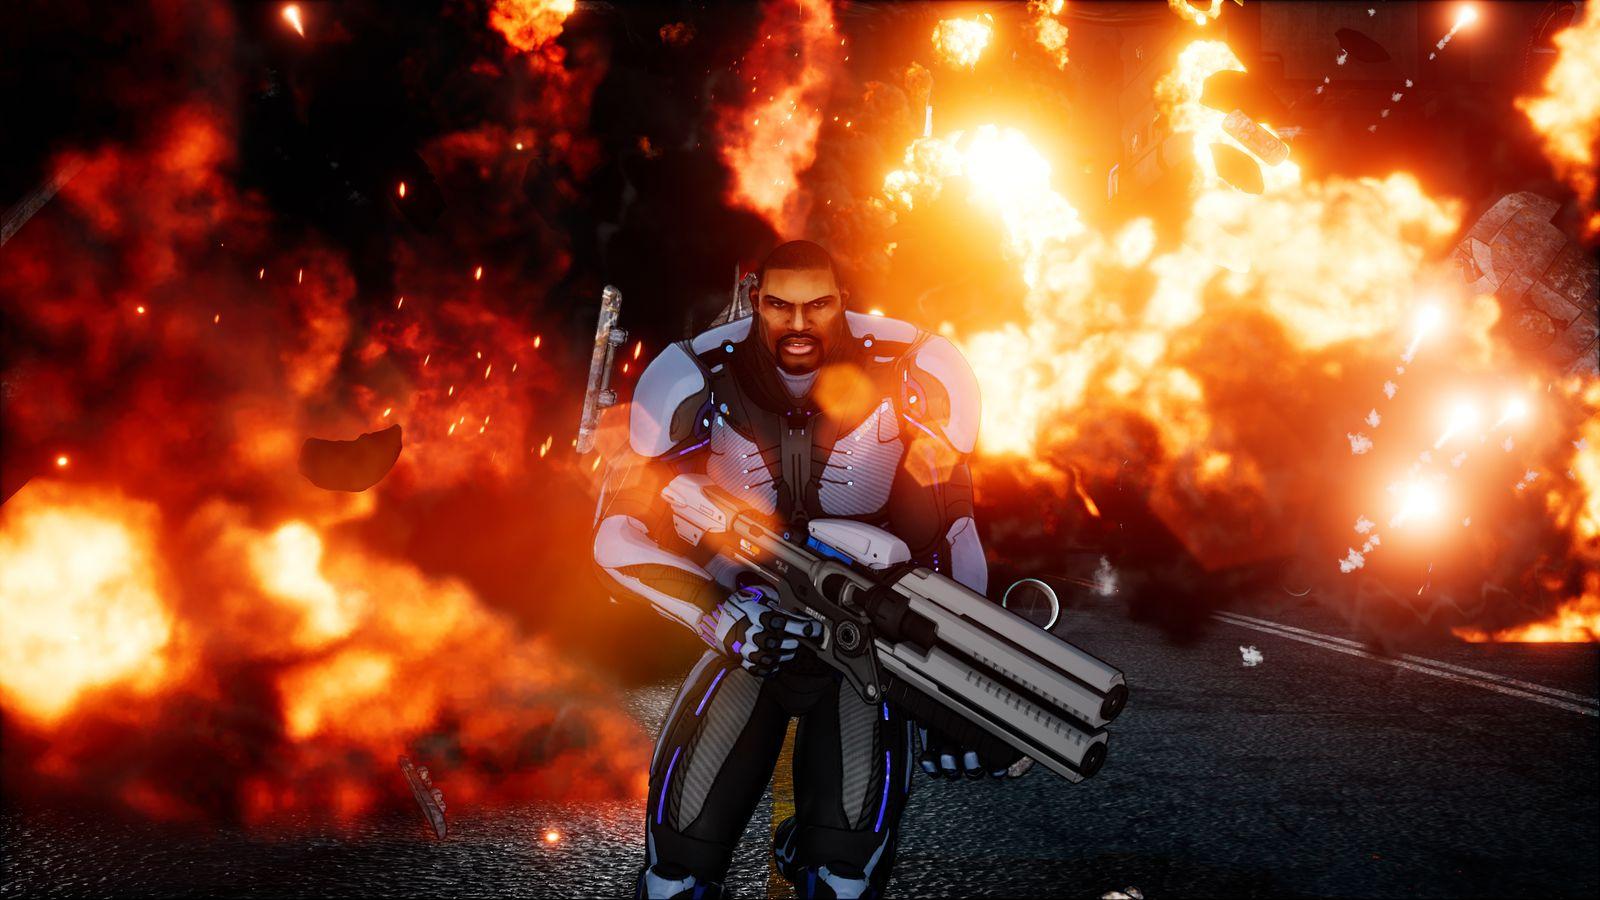 https://cdn.vox-cdn.com/thumbor/luv0axtVUzZhOGzwWBGFmcqiyzY=/0x0:3840x2160/1600x900/cdn.vox-cdn.com/uploads/chorus_image/image/56232629/Crackdown_3_Screenshot_Action_Hero_Shot.0.jpg